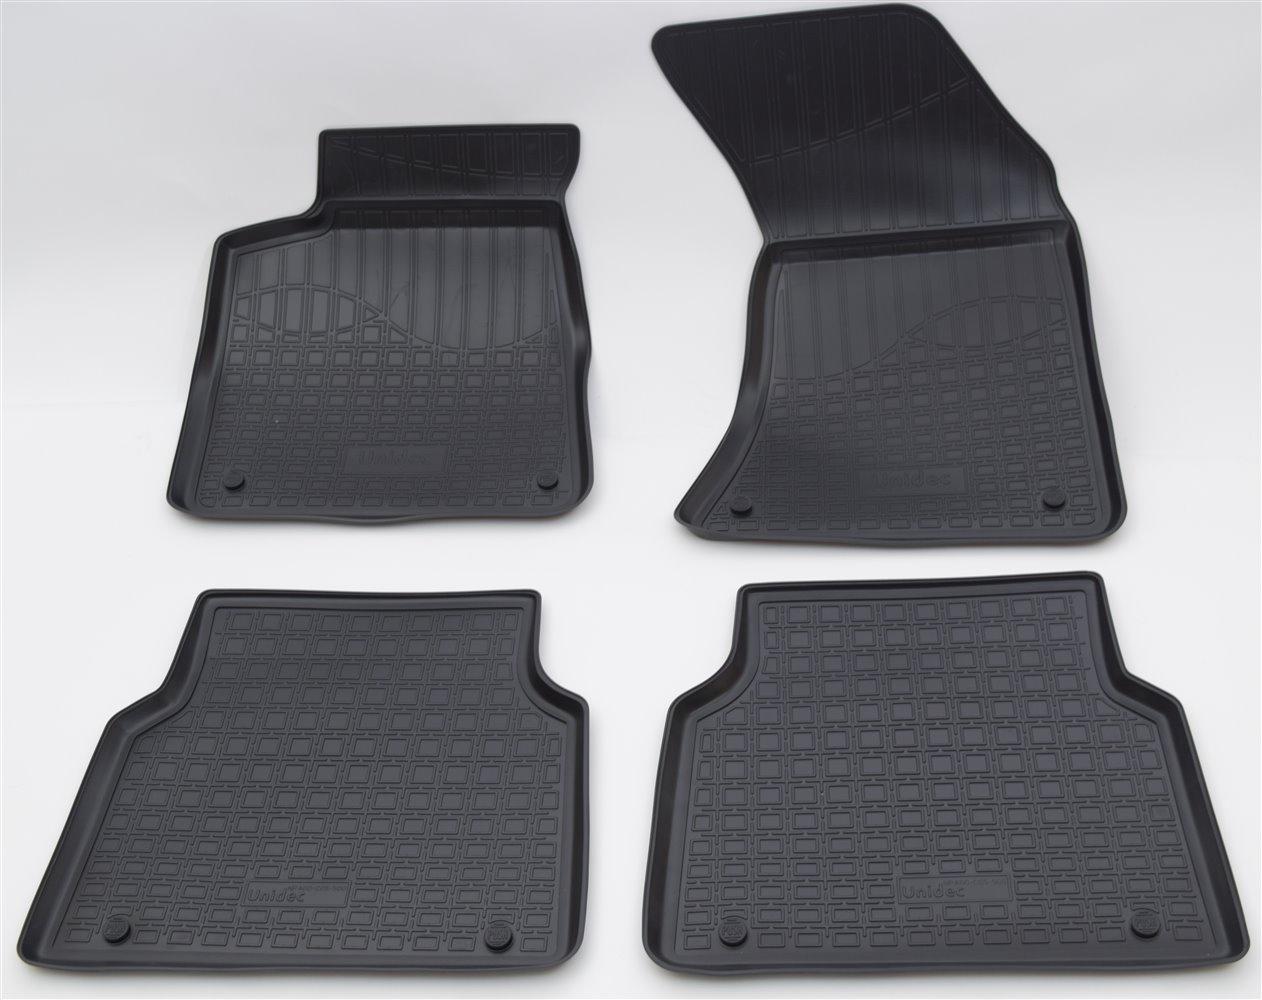 Коврики в салон автомобиля Norplast для Audi A8 D4:4H 2010, NPA00-C05-500, черный цена 2017